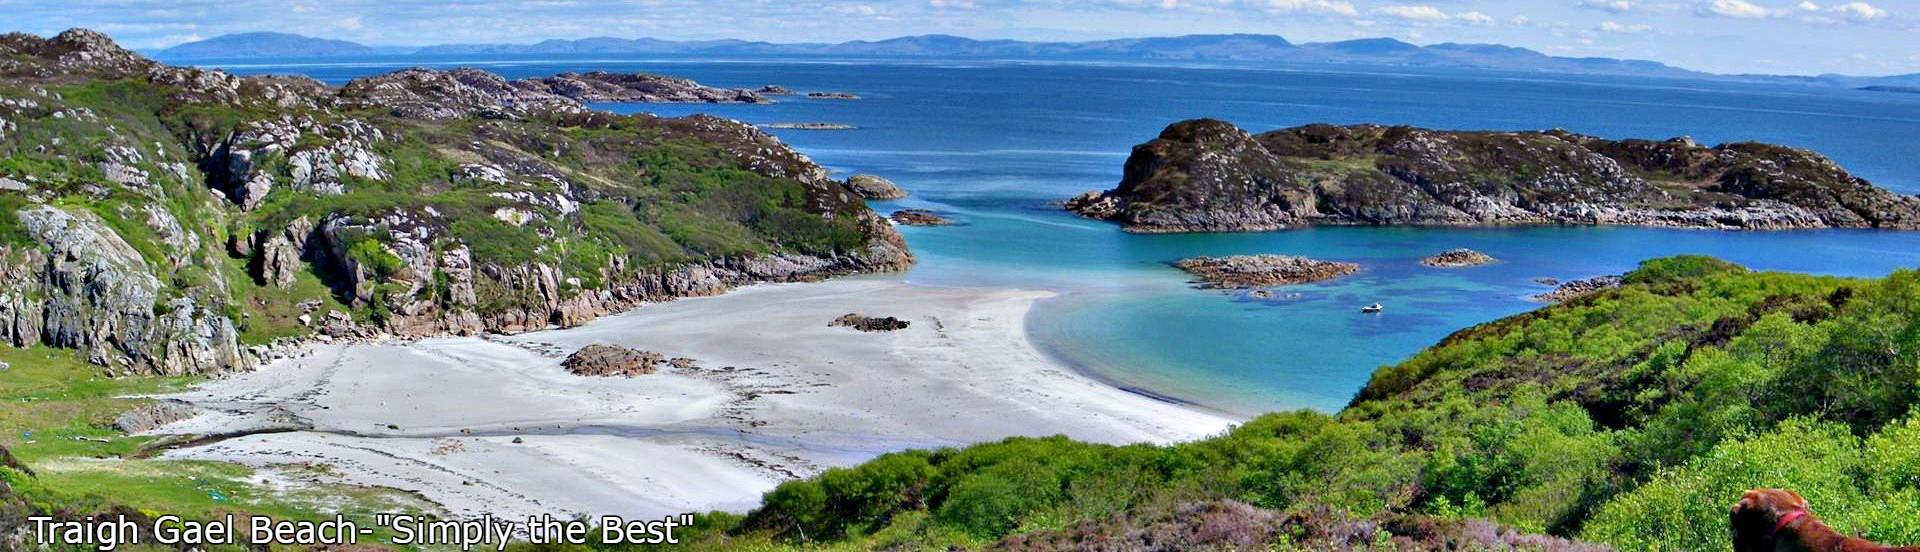 Traigh Gael Beach,Isle of Mull